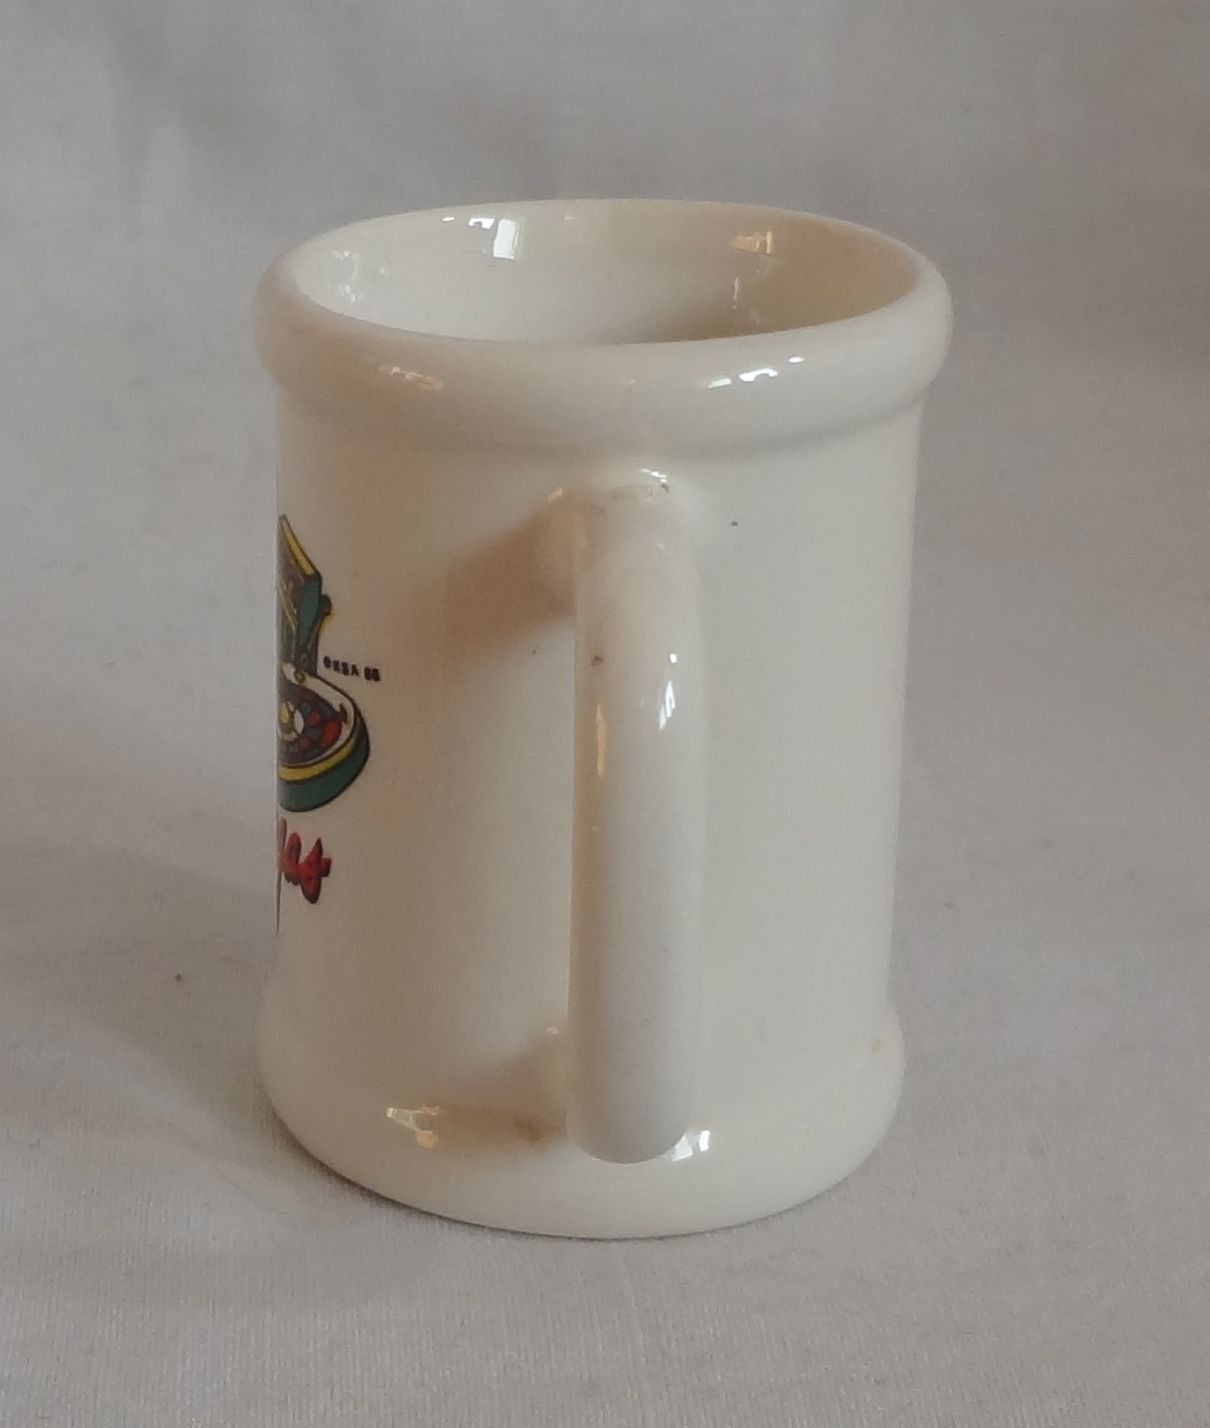 Las Vegas Gamblers Handled Ceramic Stein Mug 2 oz Shot Glass Barware Souvenir